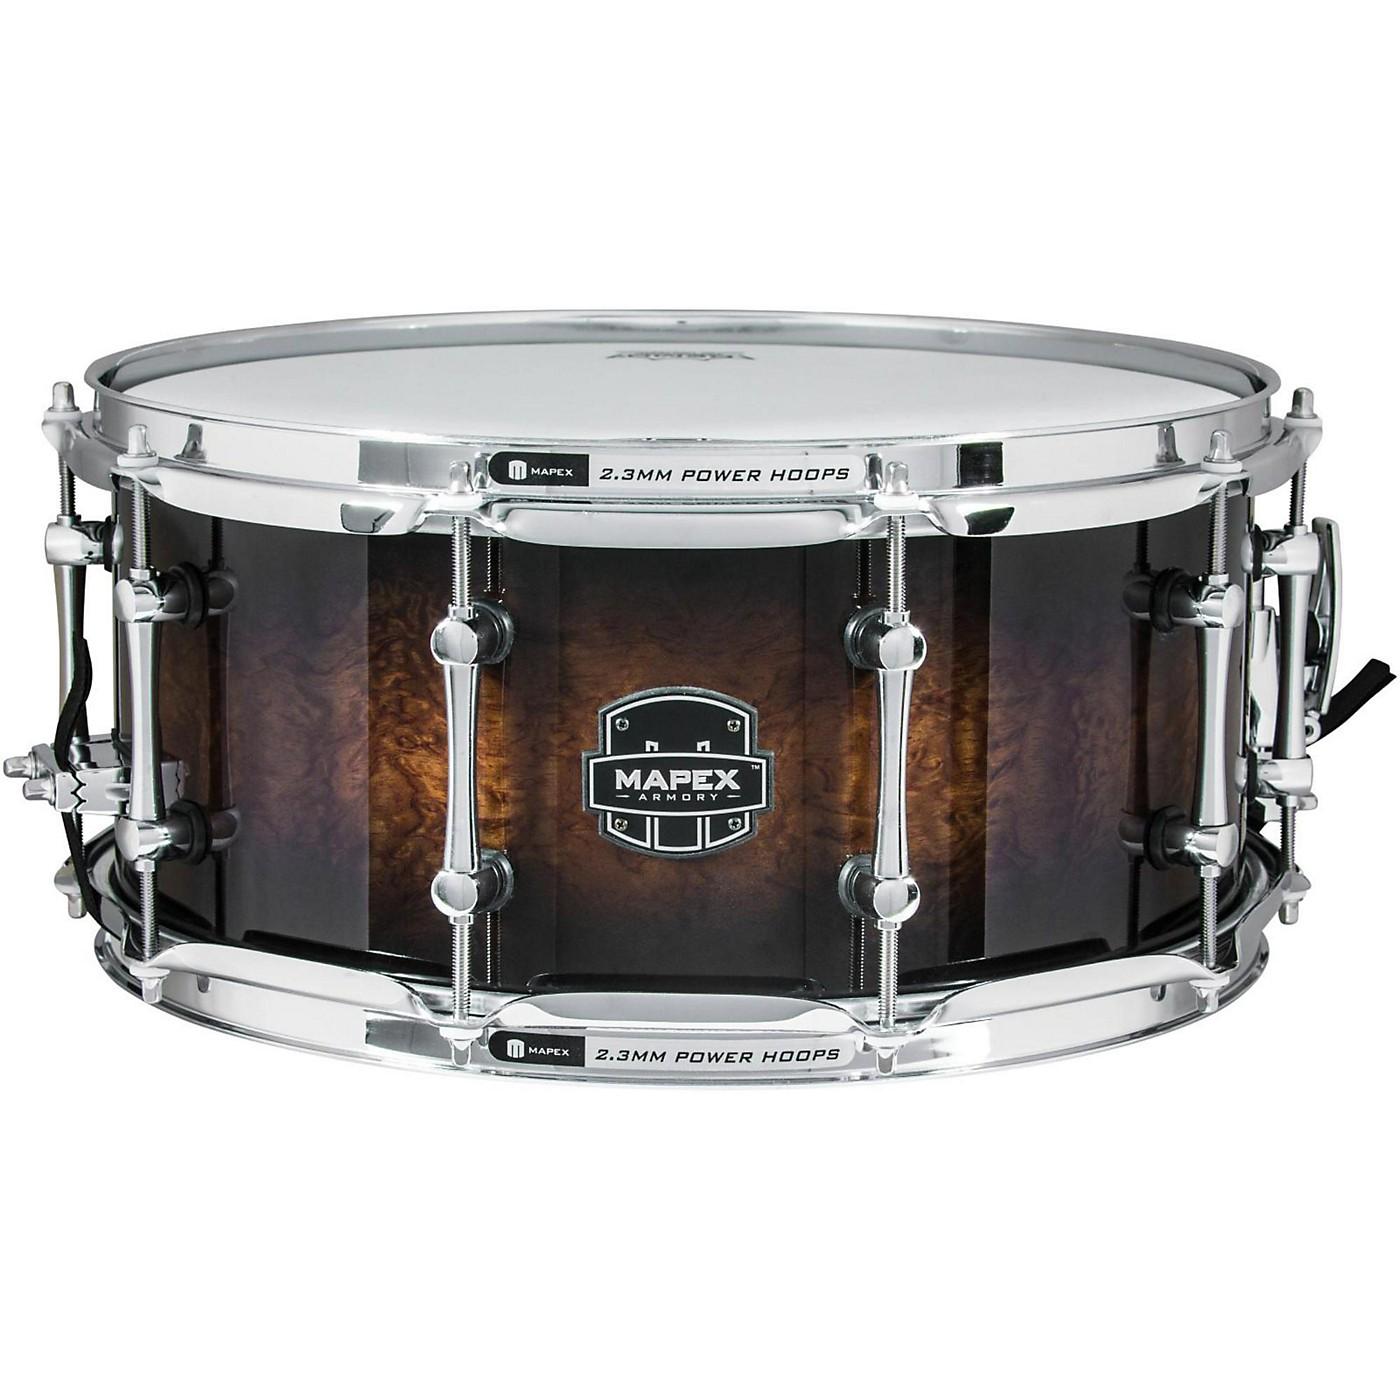 Mapex Armory Series Exterminator Snare Drum 14 x 6.5 thumbnail